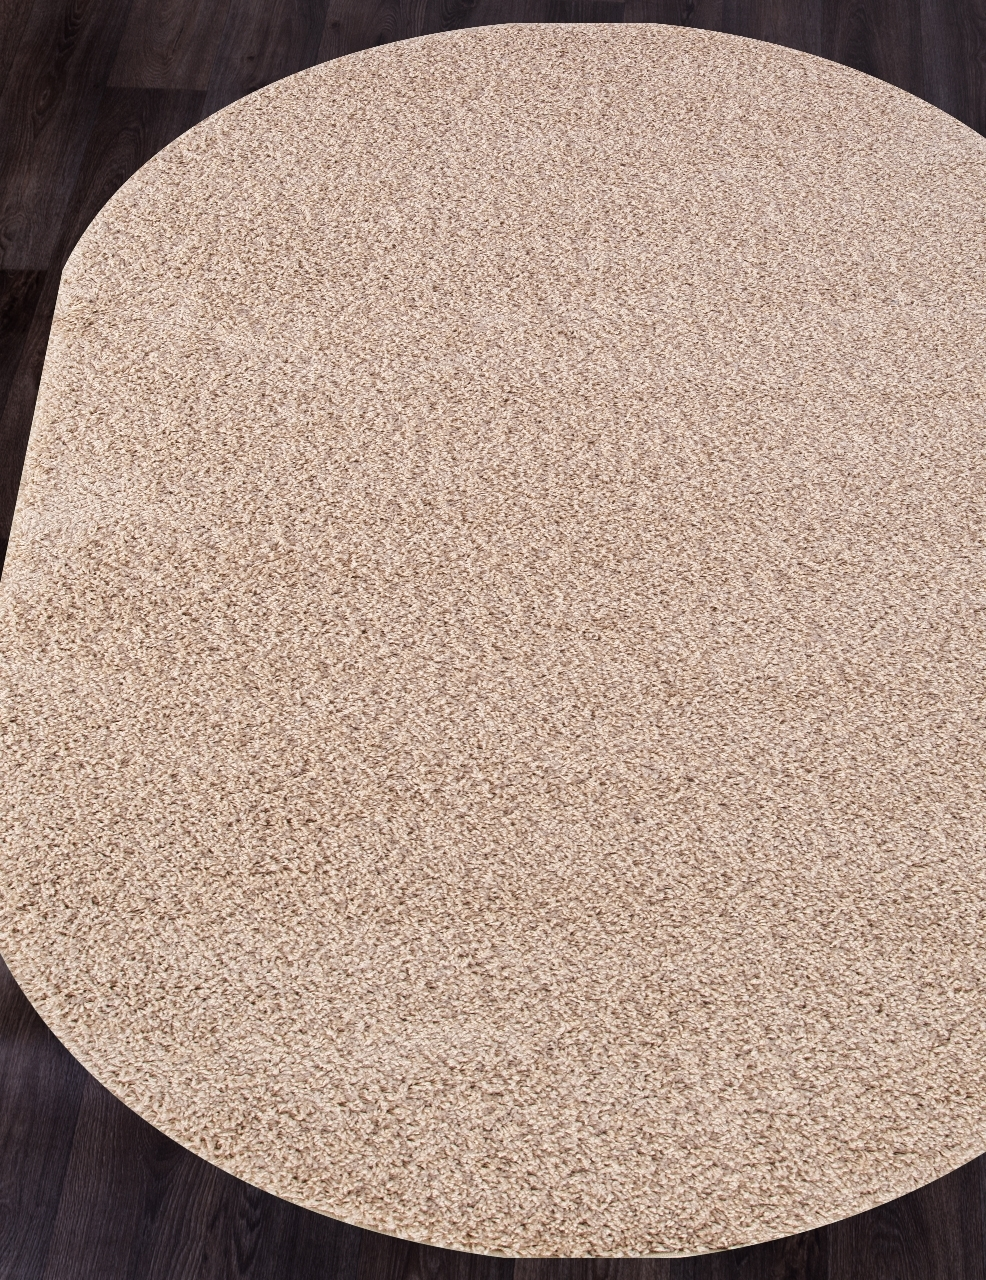 Ковер S600 - WARM BEIGE - Овал - коллекция FUTURA - фото 1